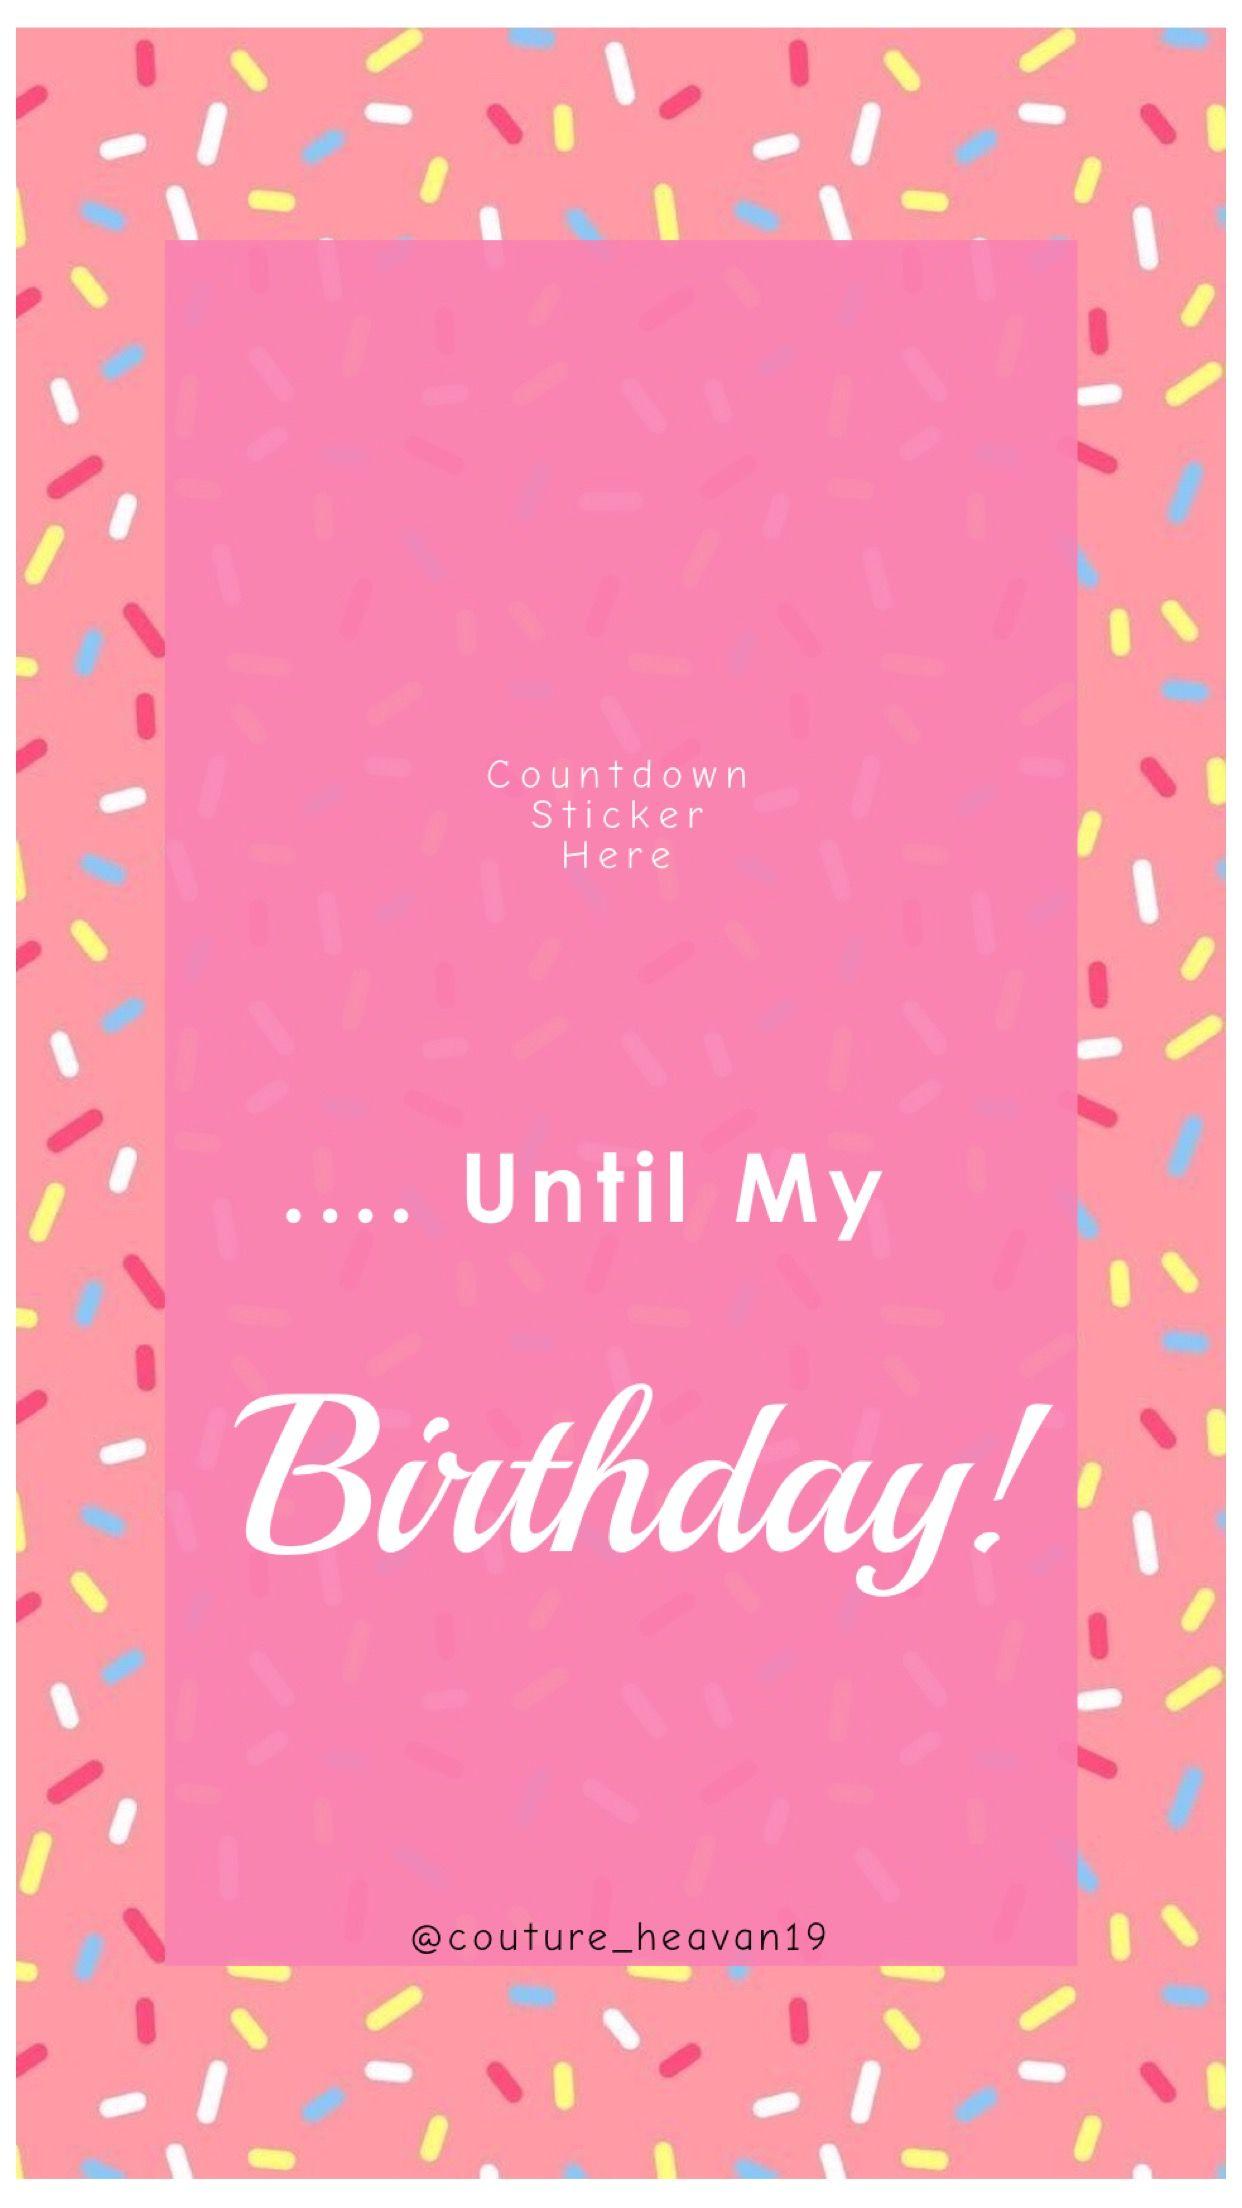 Instagram Story Templates Birthday Countdown Instagram Story Template Its My Birthday